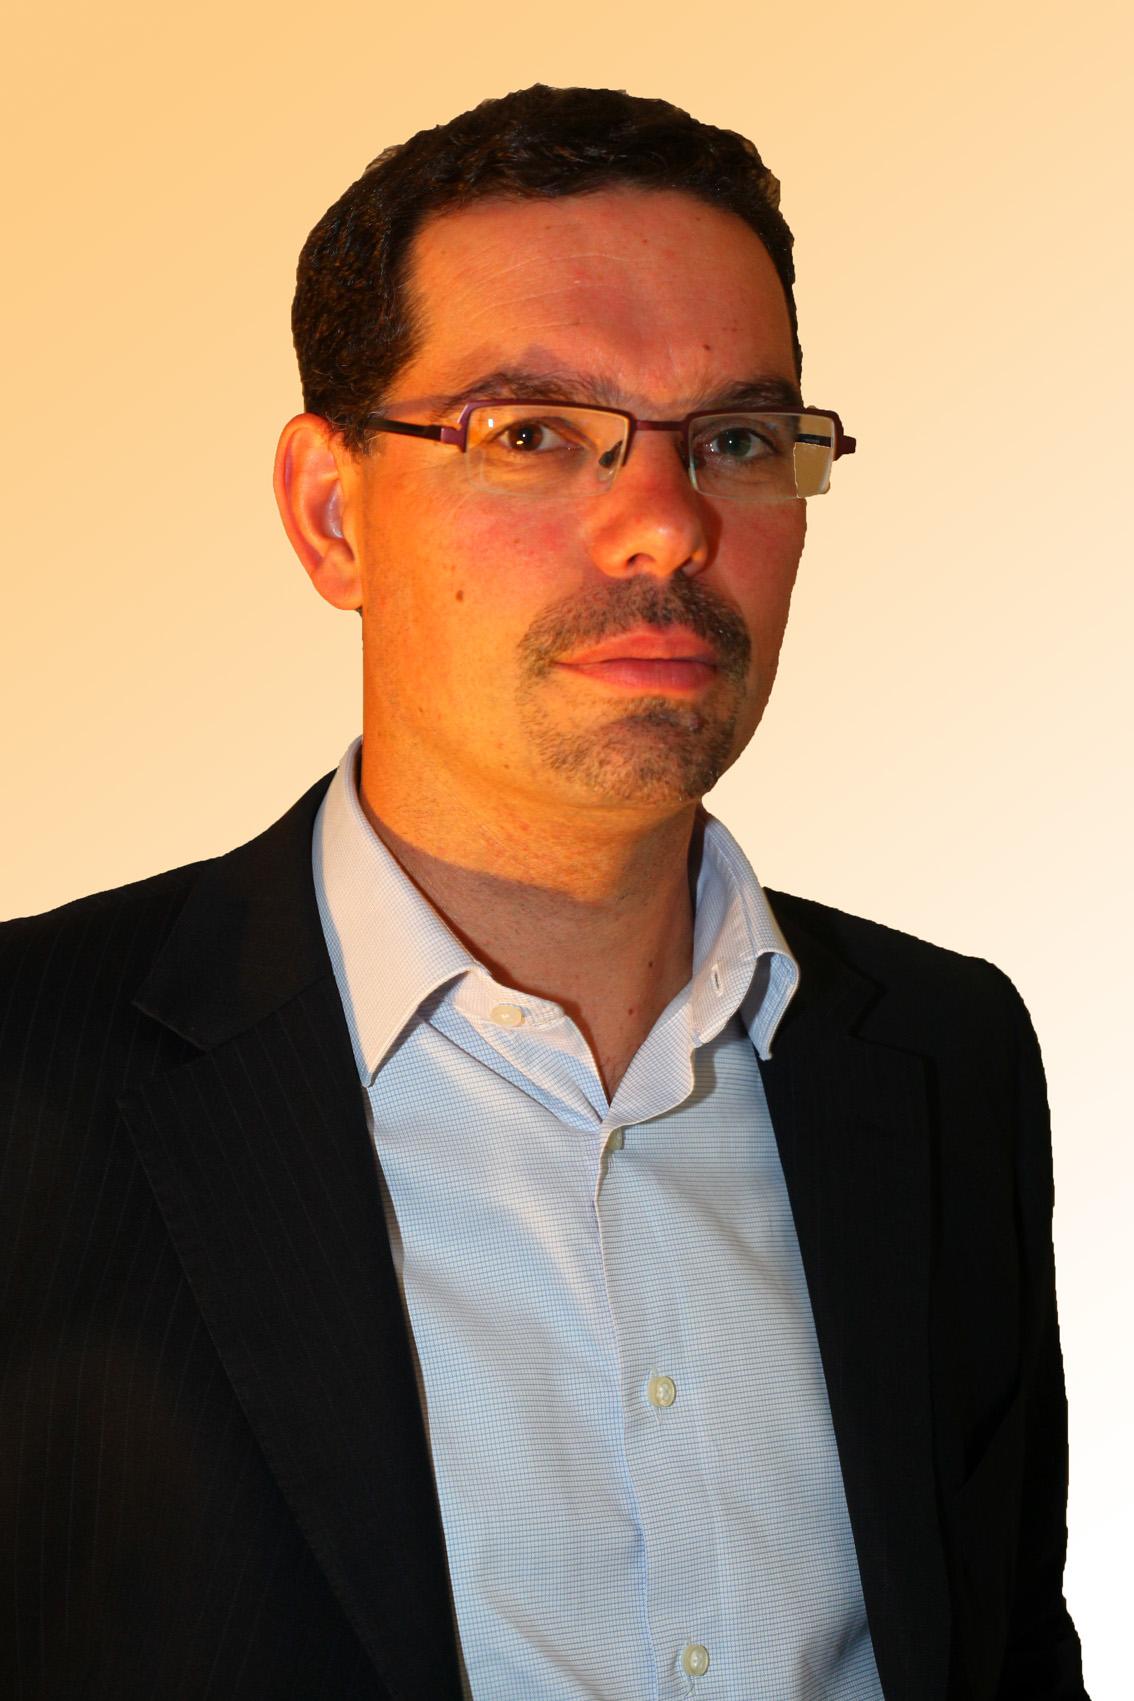 Laurent Grandguillot, HPE